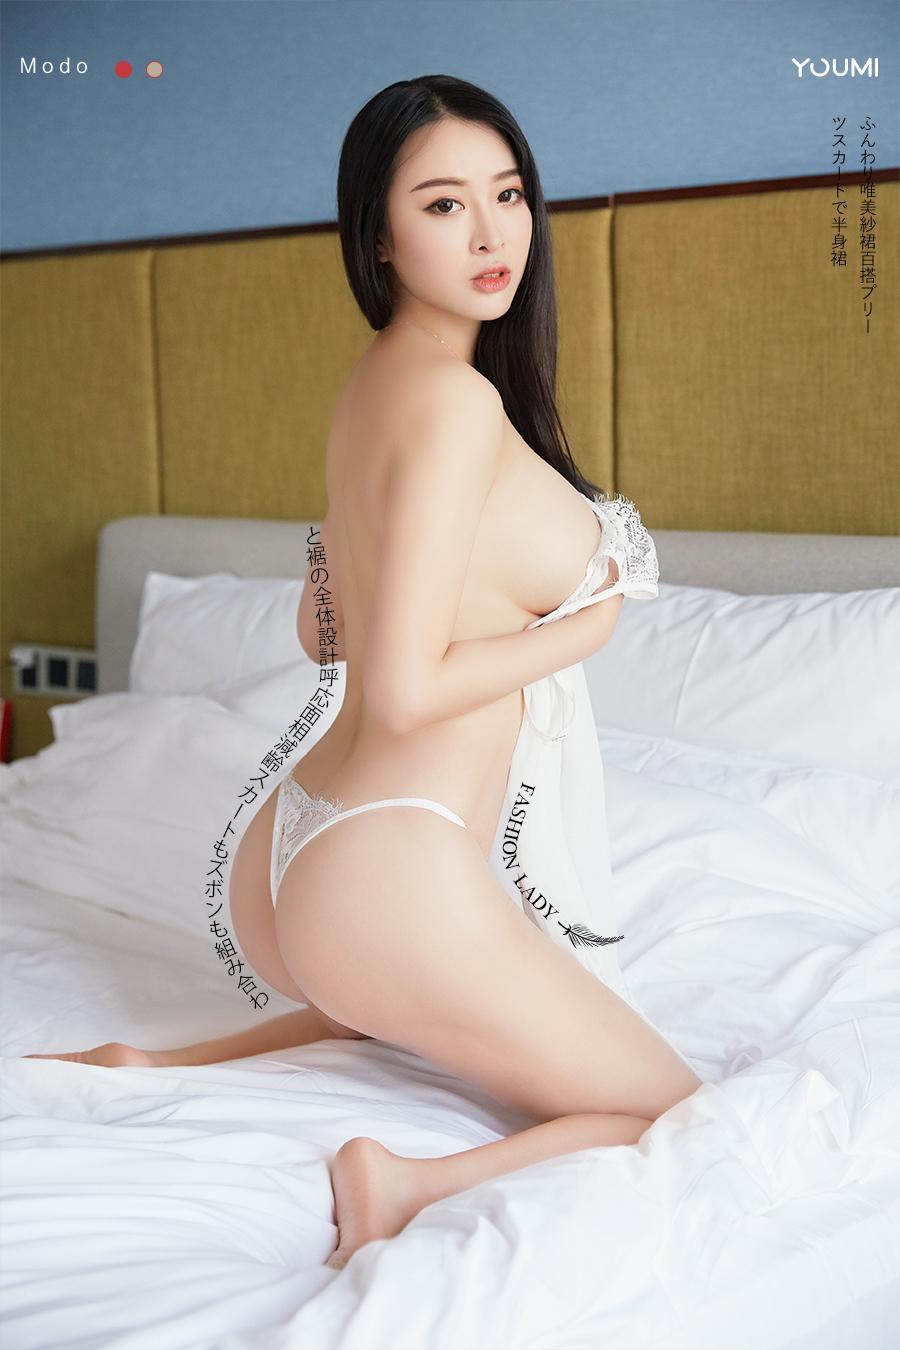 [YouMi尤蜜]2020.04.23 蜜桃小兔 周欣琪[/18MB]